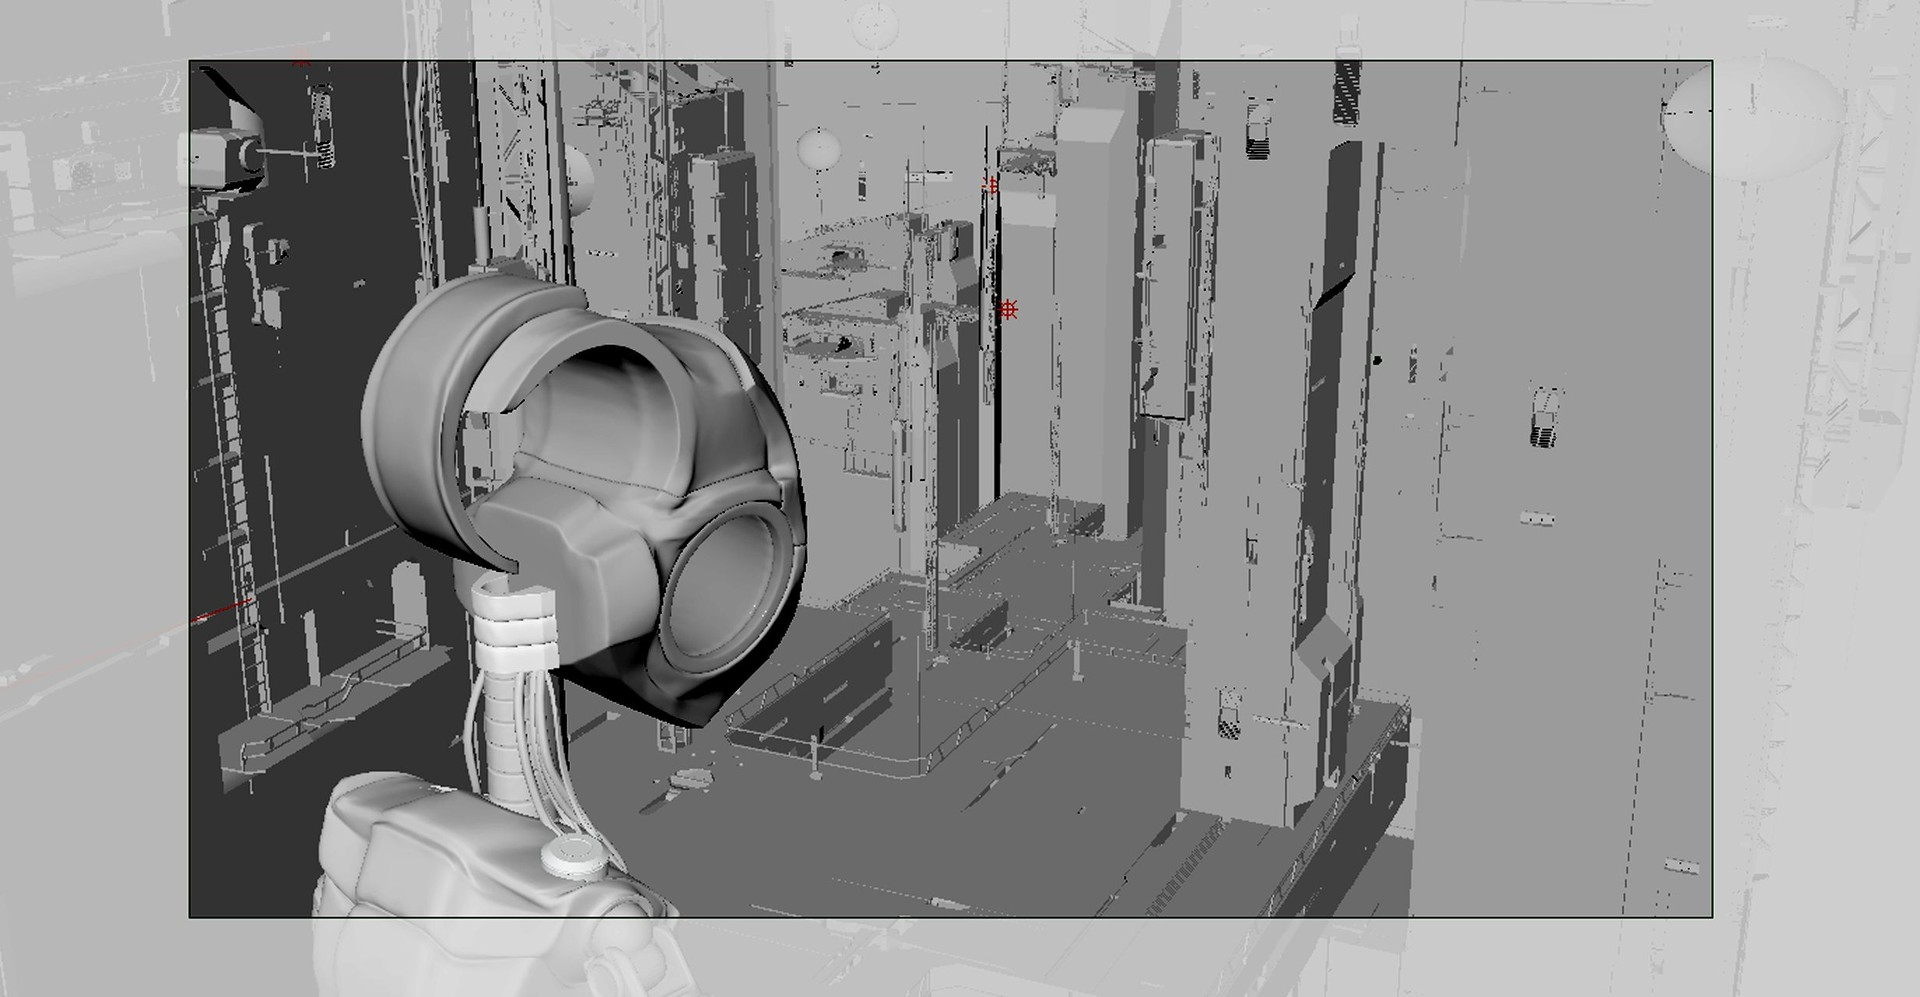 Stijn windig bot clr 02 process1